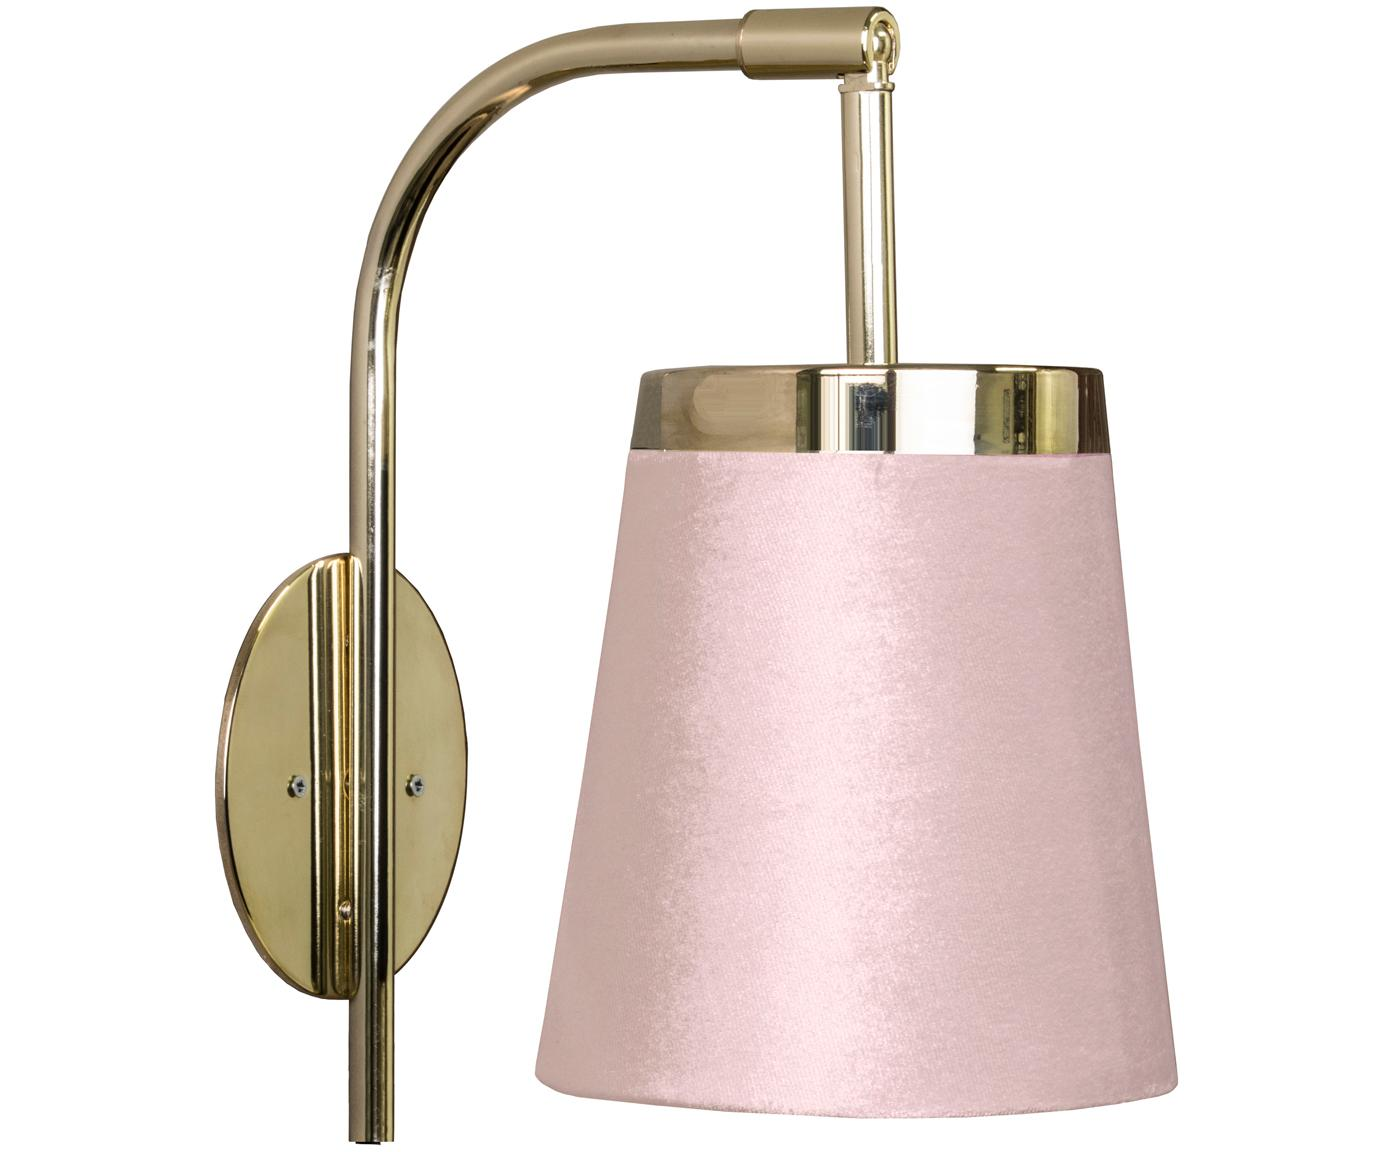 Wandlamp England met stekker, Lampenkap: polyester fluweel, Messingkleurig, roze, 14 x 25 cm